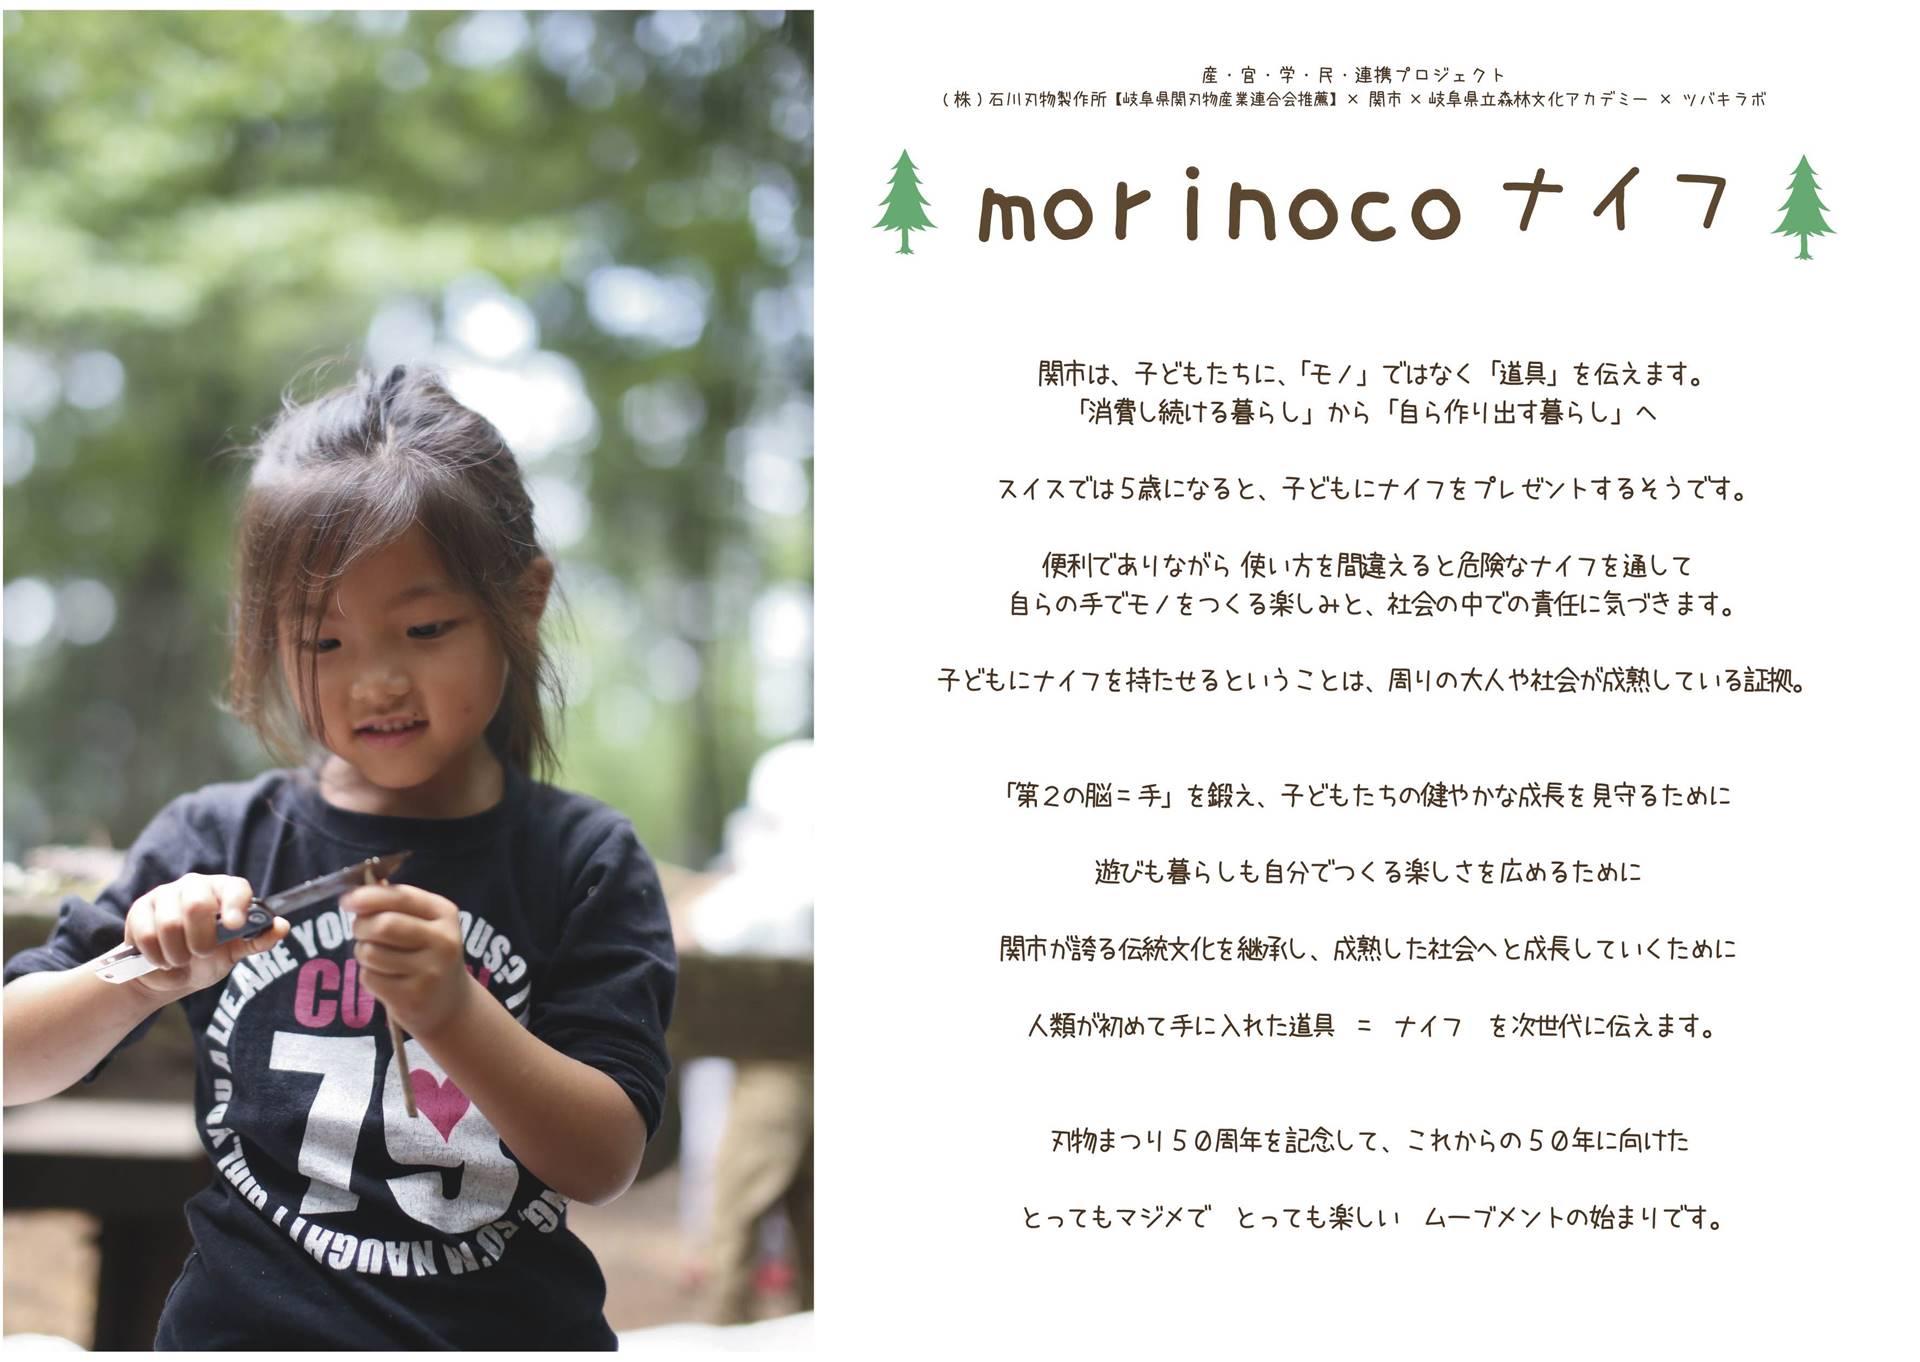 morinocoナイフ 関市 刃物 ツバキラボ 石川刃物製作所 アウトドアナイフ 子ども用